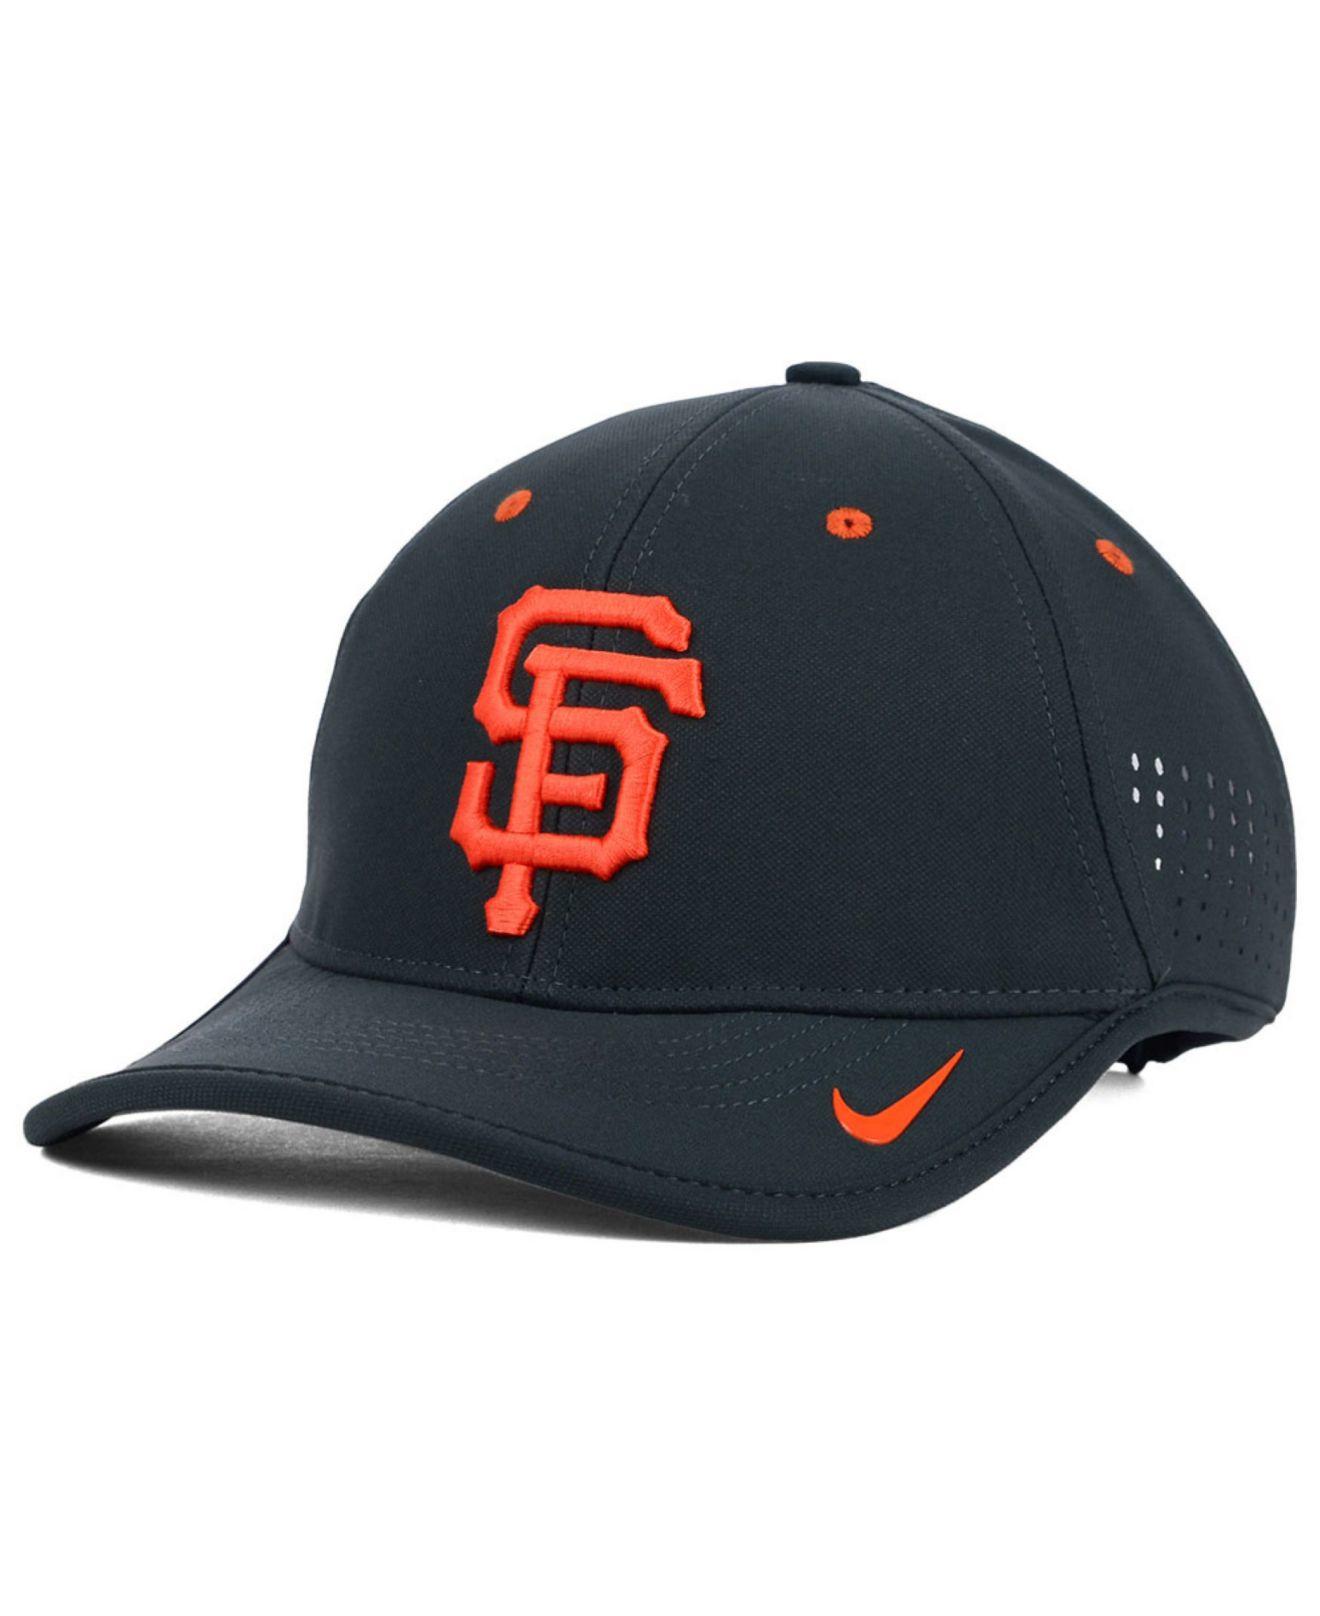 3f53f986f5bba Nike San Francisco Giants Vapor Swoosh Adjustable Cap in Gray for ...